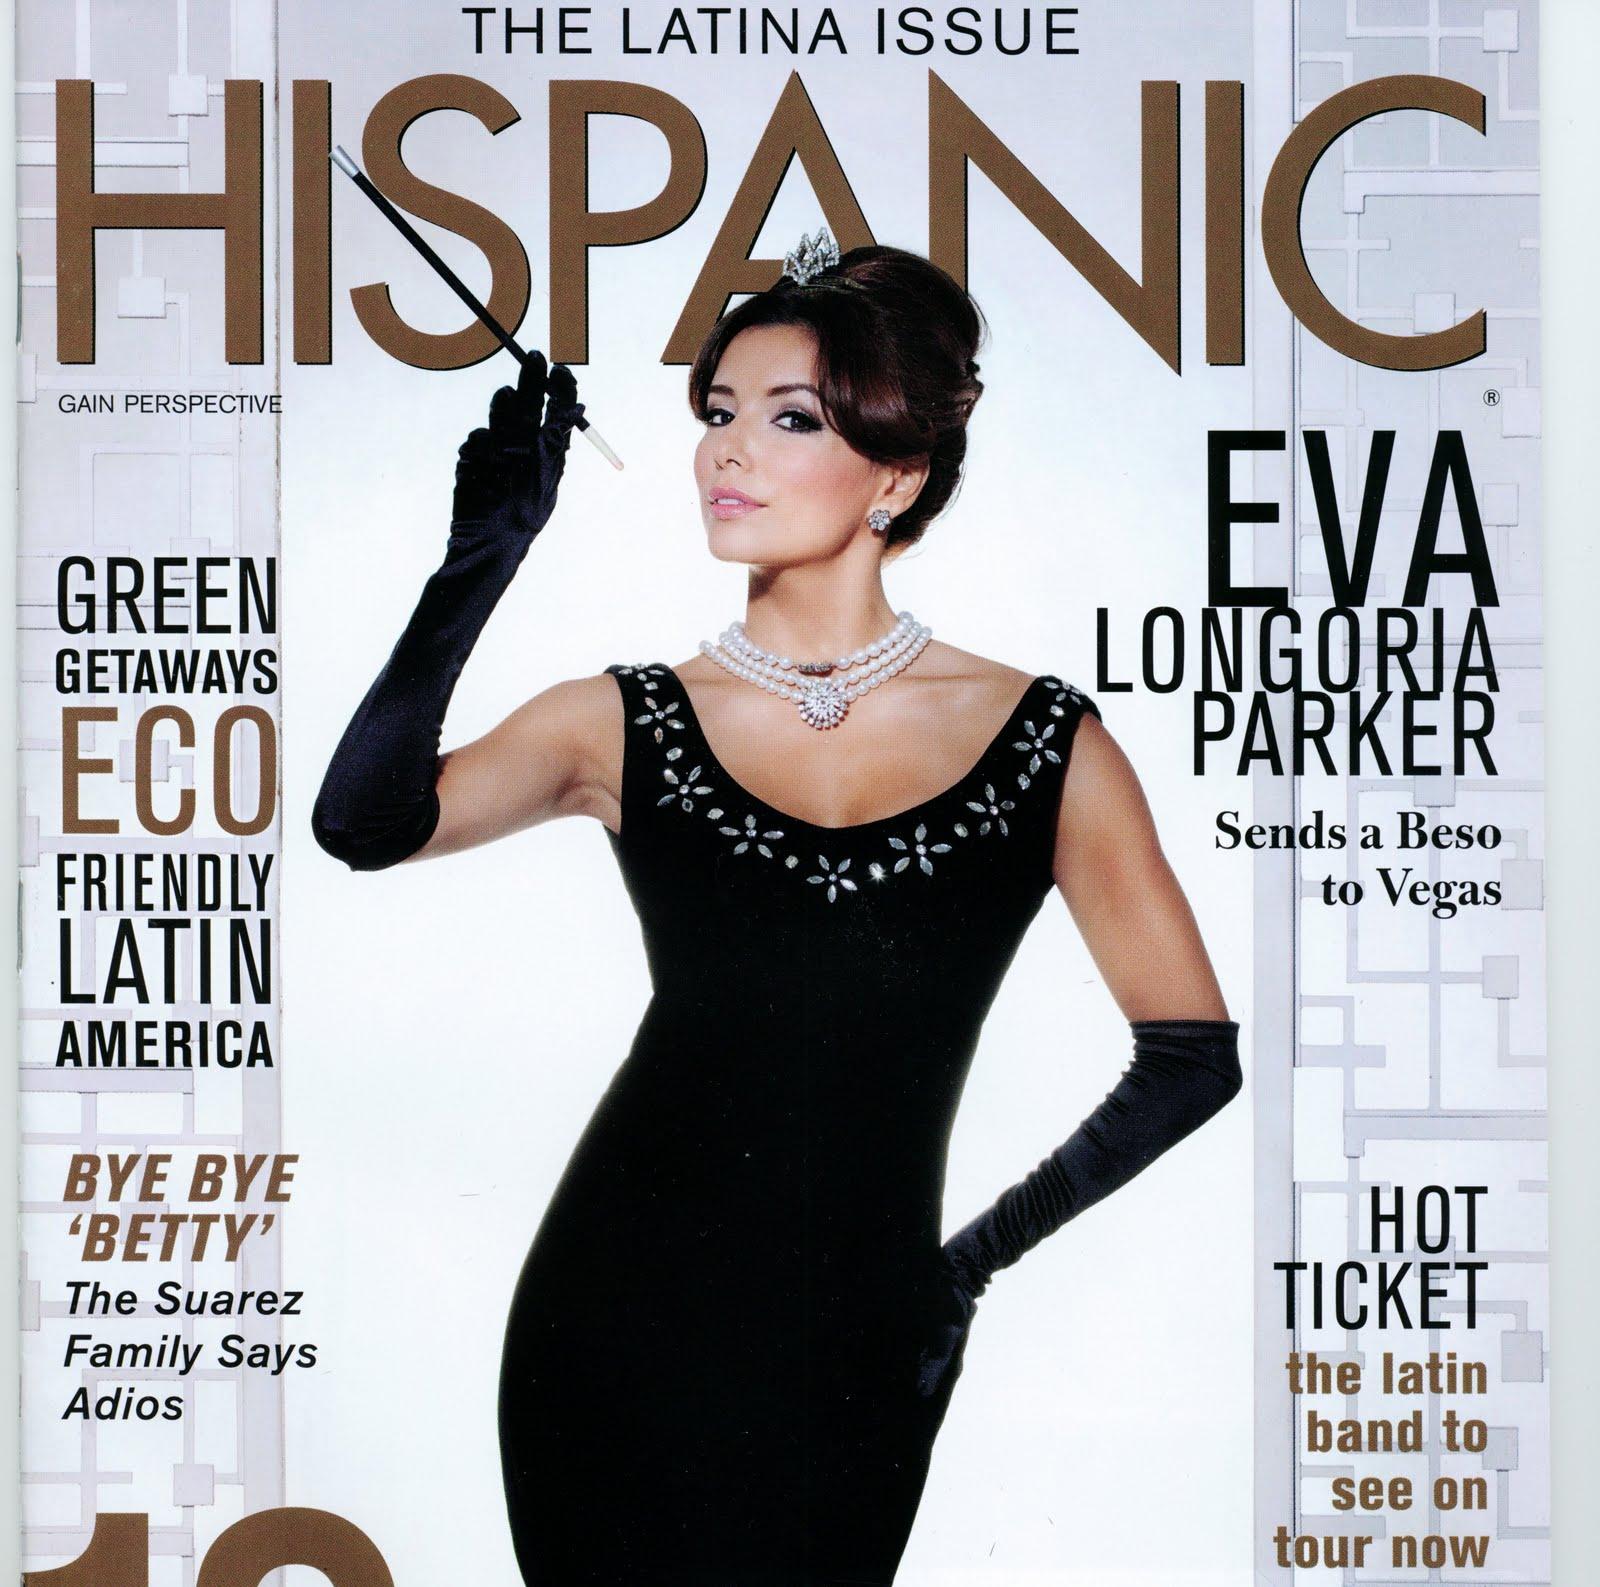 http://1.bp.blogspot.com/_CoPrI-7kkDI/TReYxtuqFTI/AAAAAAAAAtY/yedxk68rXXU/s1600/Hispanic_final+cover.jpg